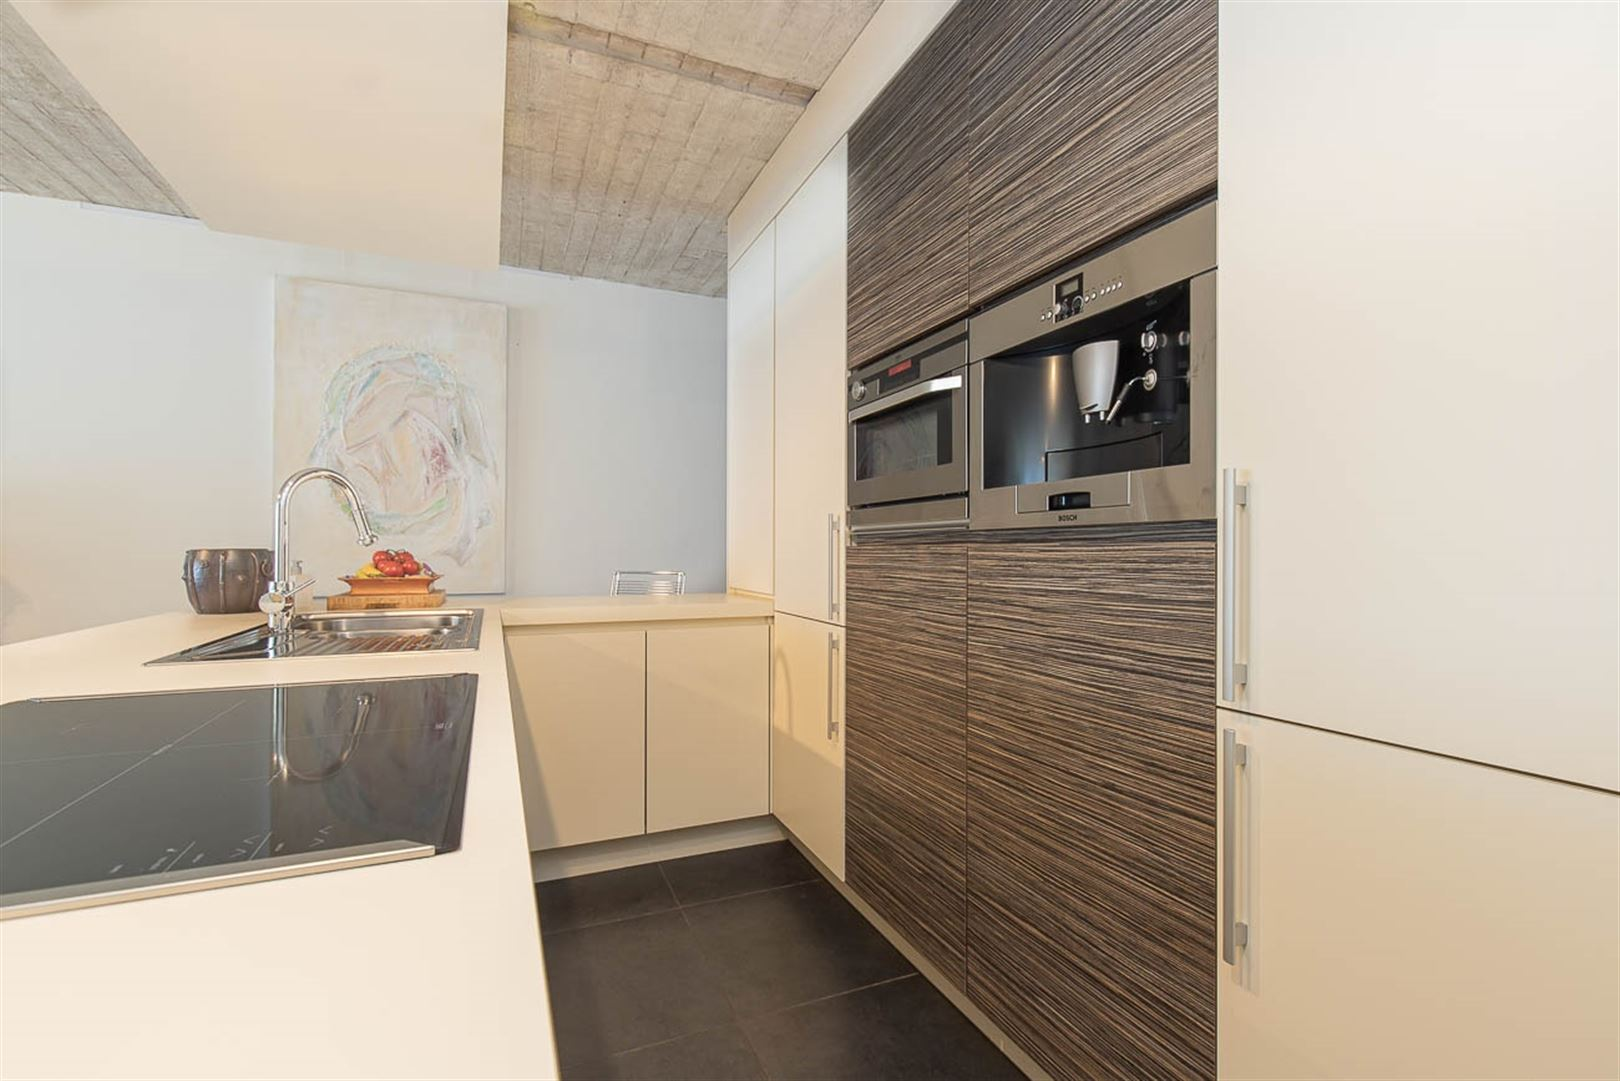 Foto 11 : Duplex/triplex te 9200 DENDERMONDE (België) - Prijs € 495.000